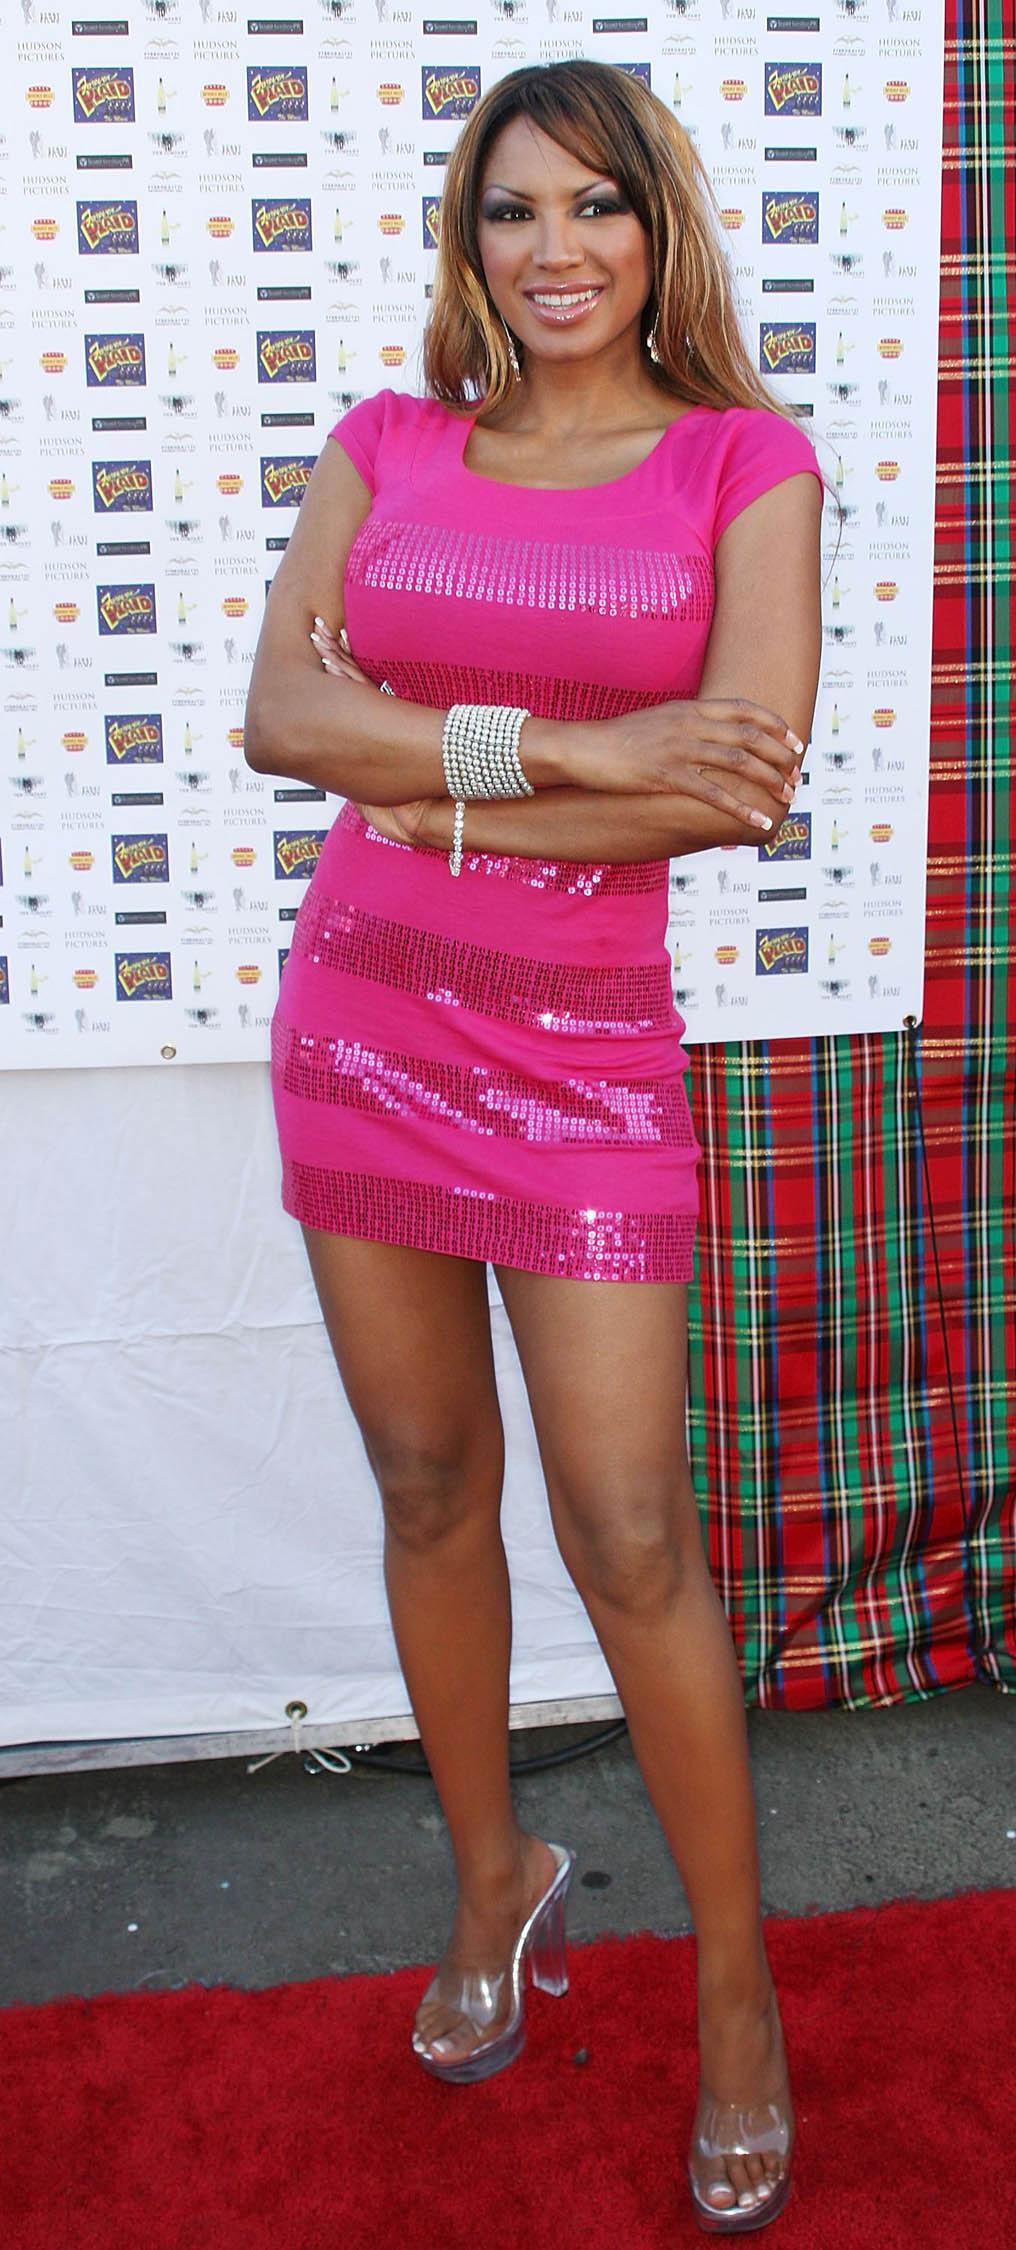 Upasna Singh Hot tube Lynette Curran,Sally Phillips (born 1970)